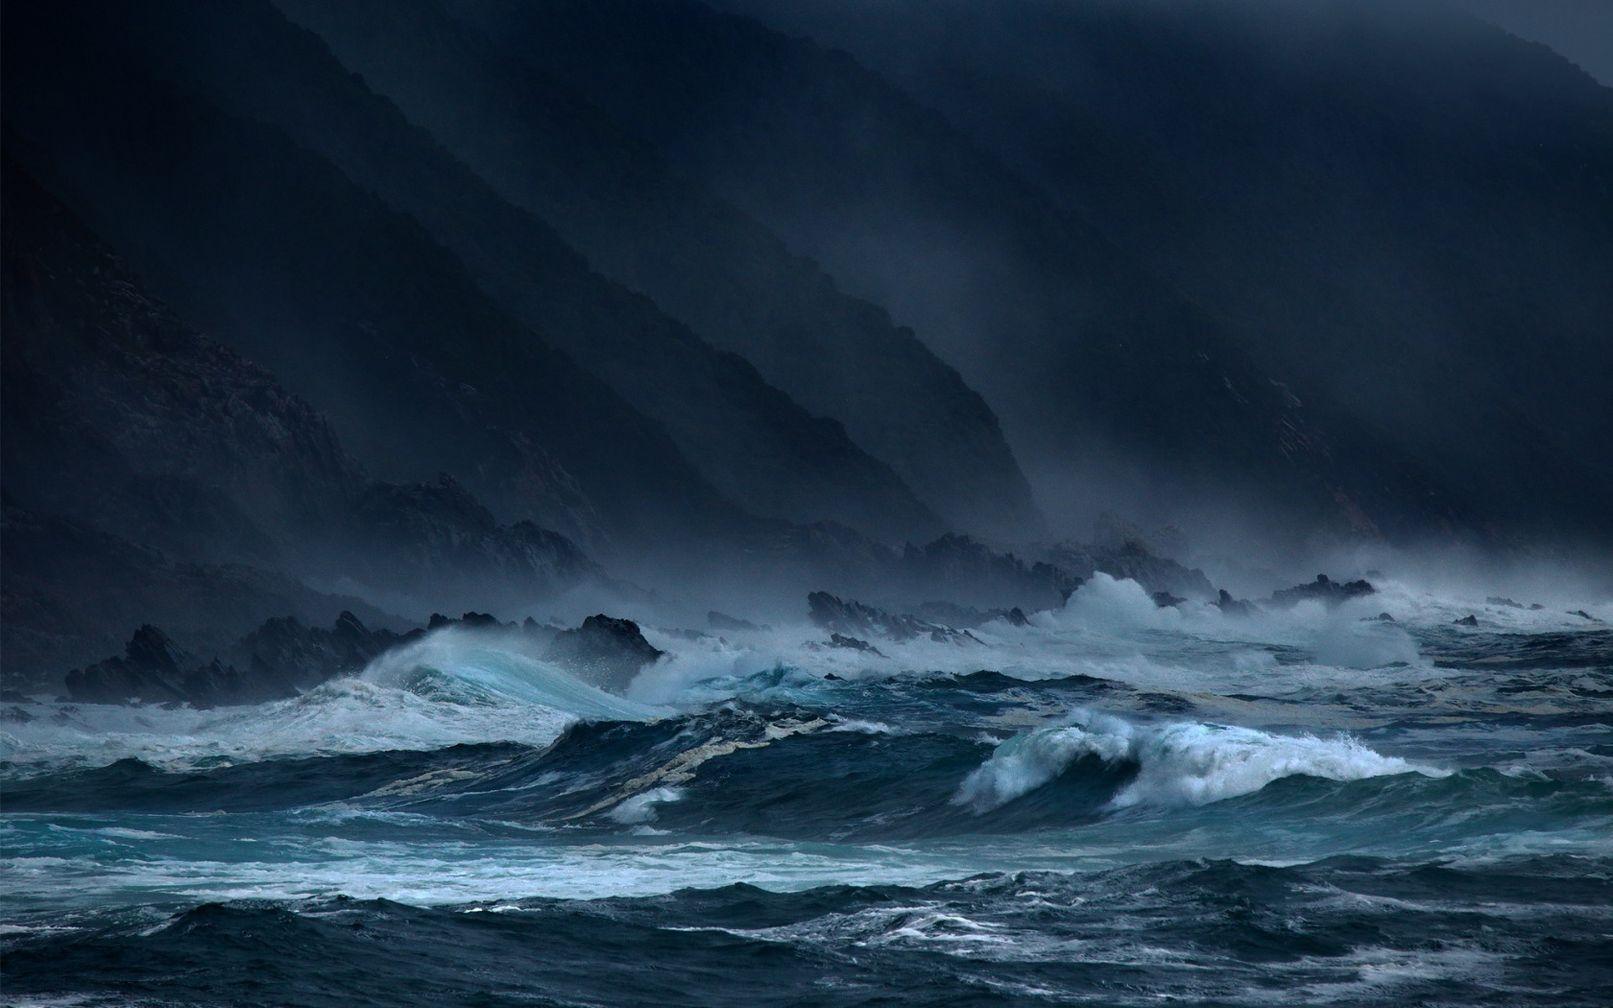 Шторм в океане картинка на телефон